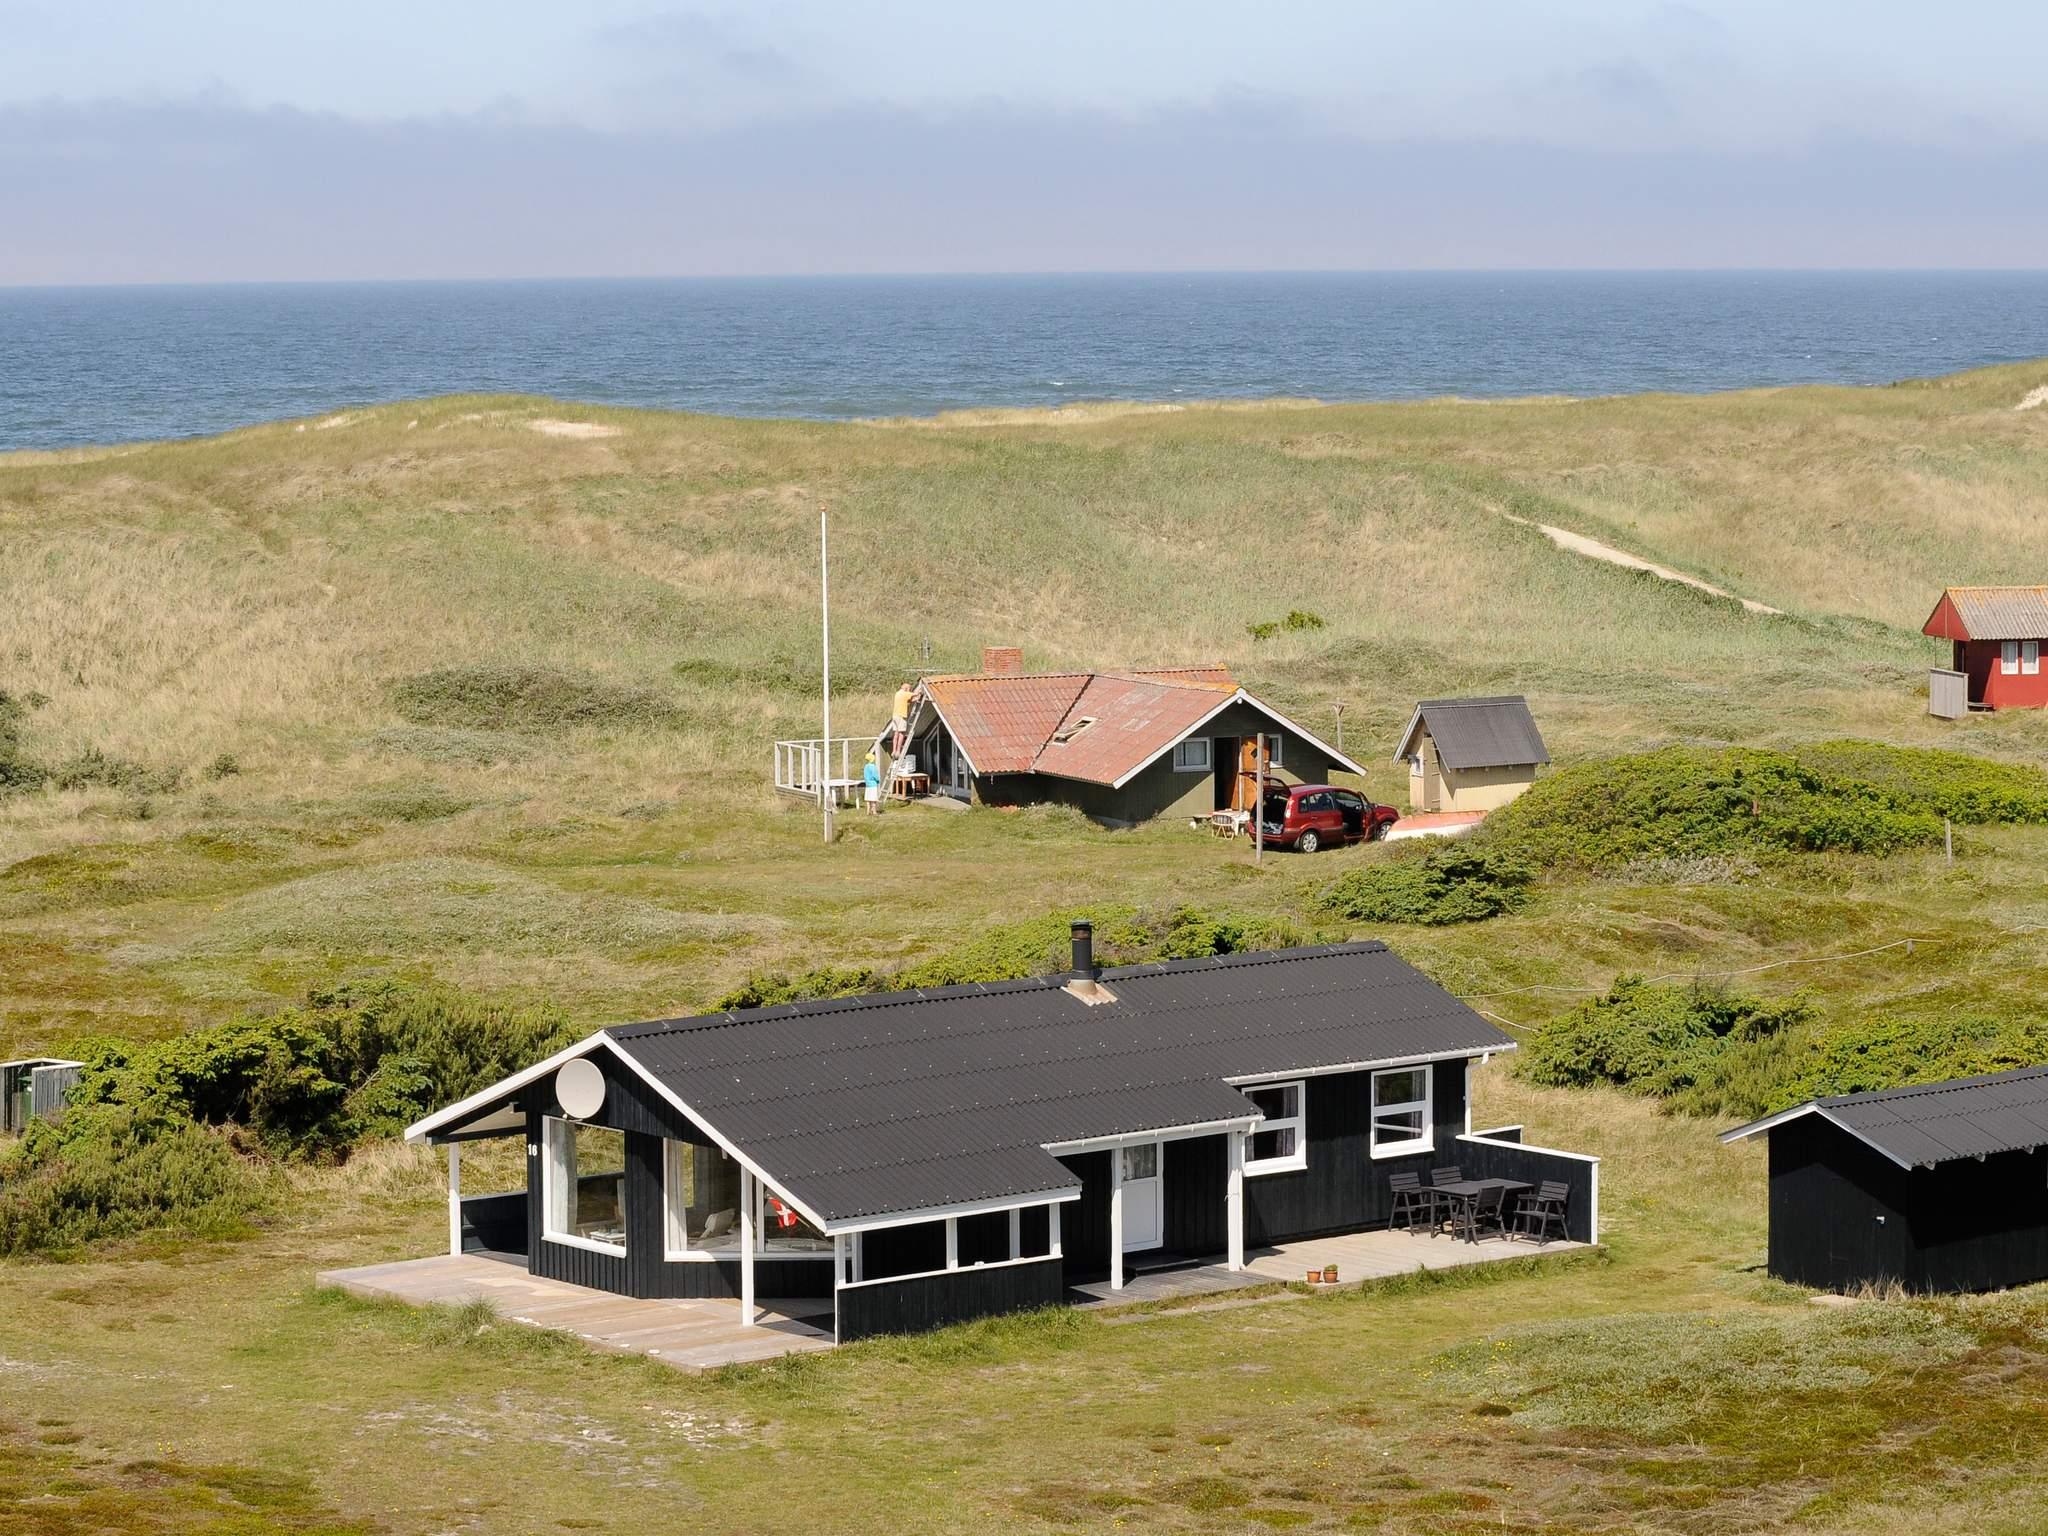 Ferienhaus Vrist (81919), Vrist, , Limfjord, Dänemark, Bild 1